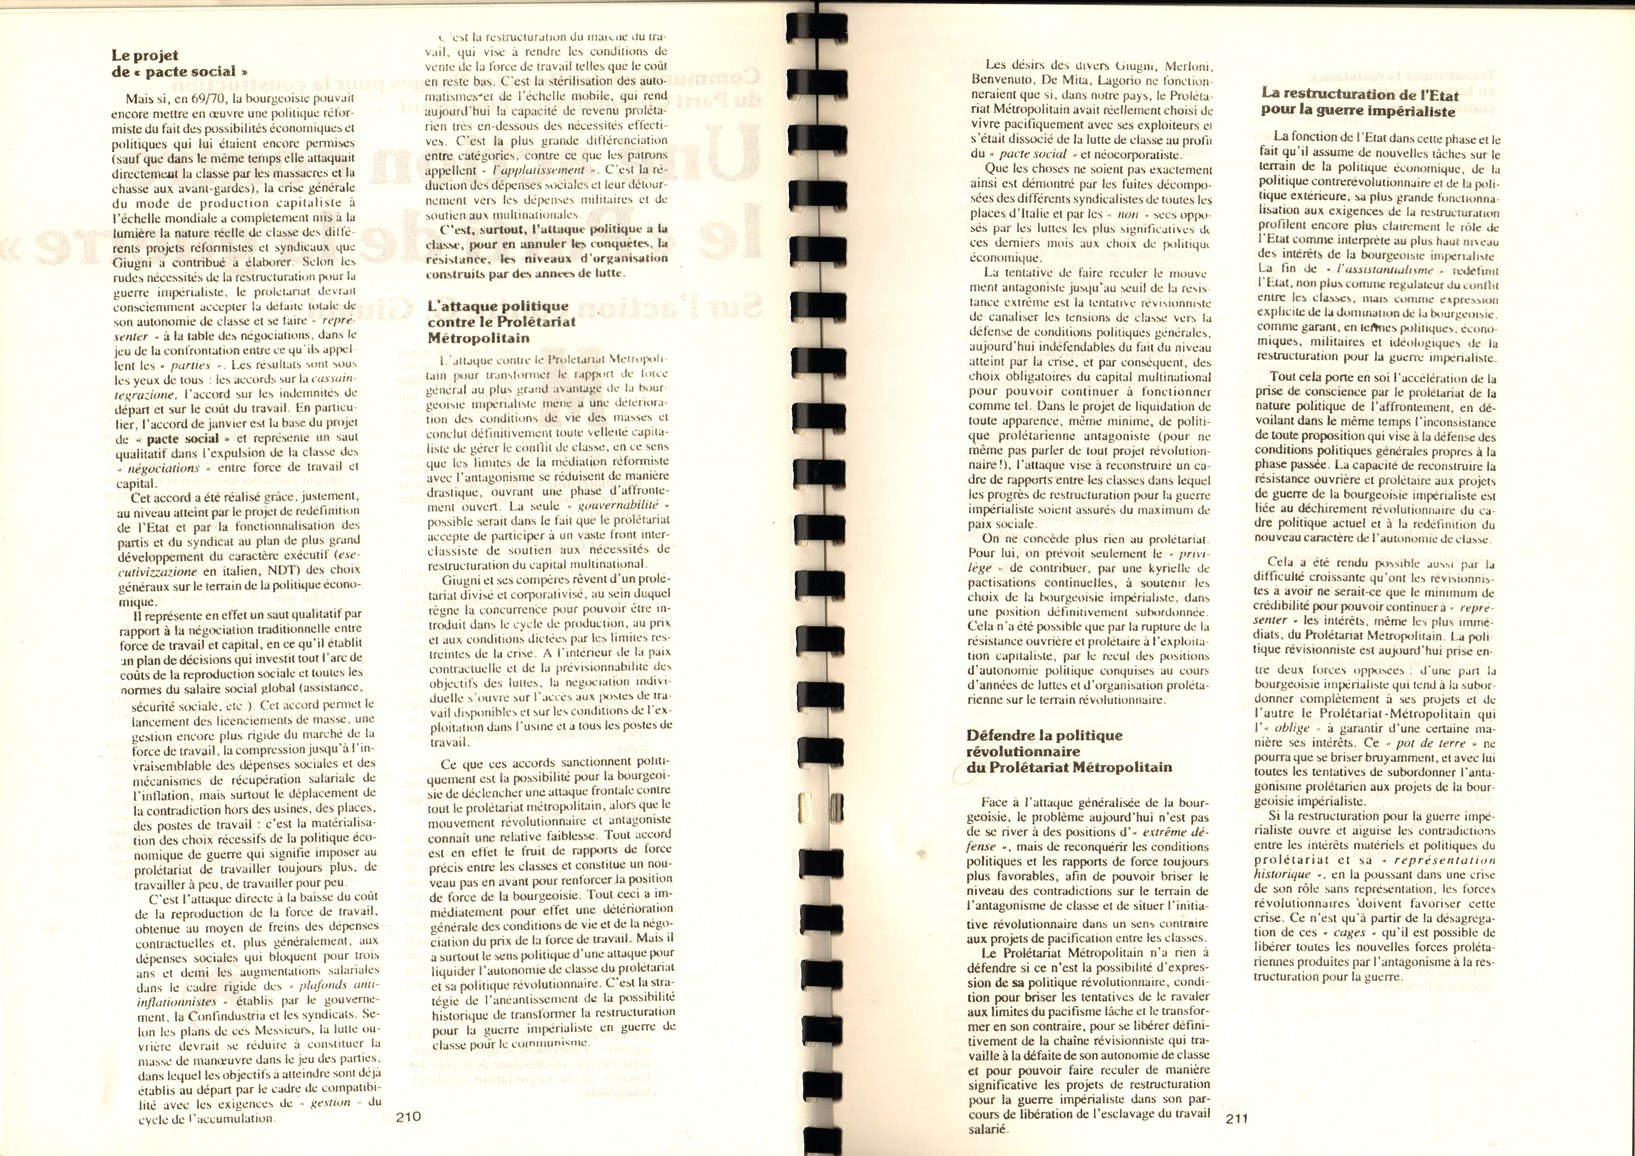 Internationale_Debatte_1985_Brigate_Rosse_106